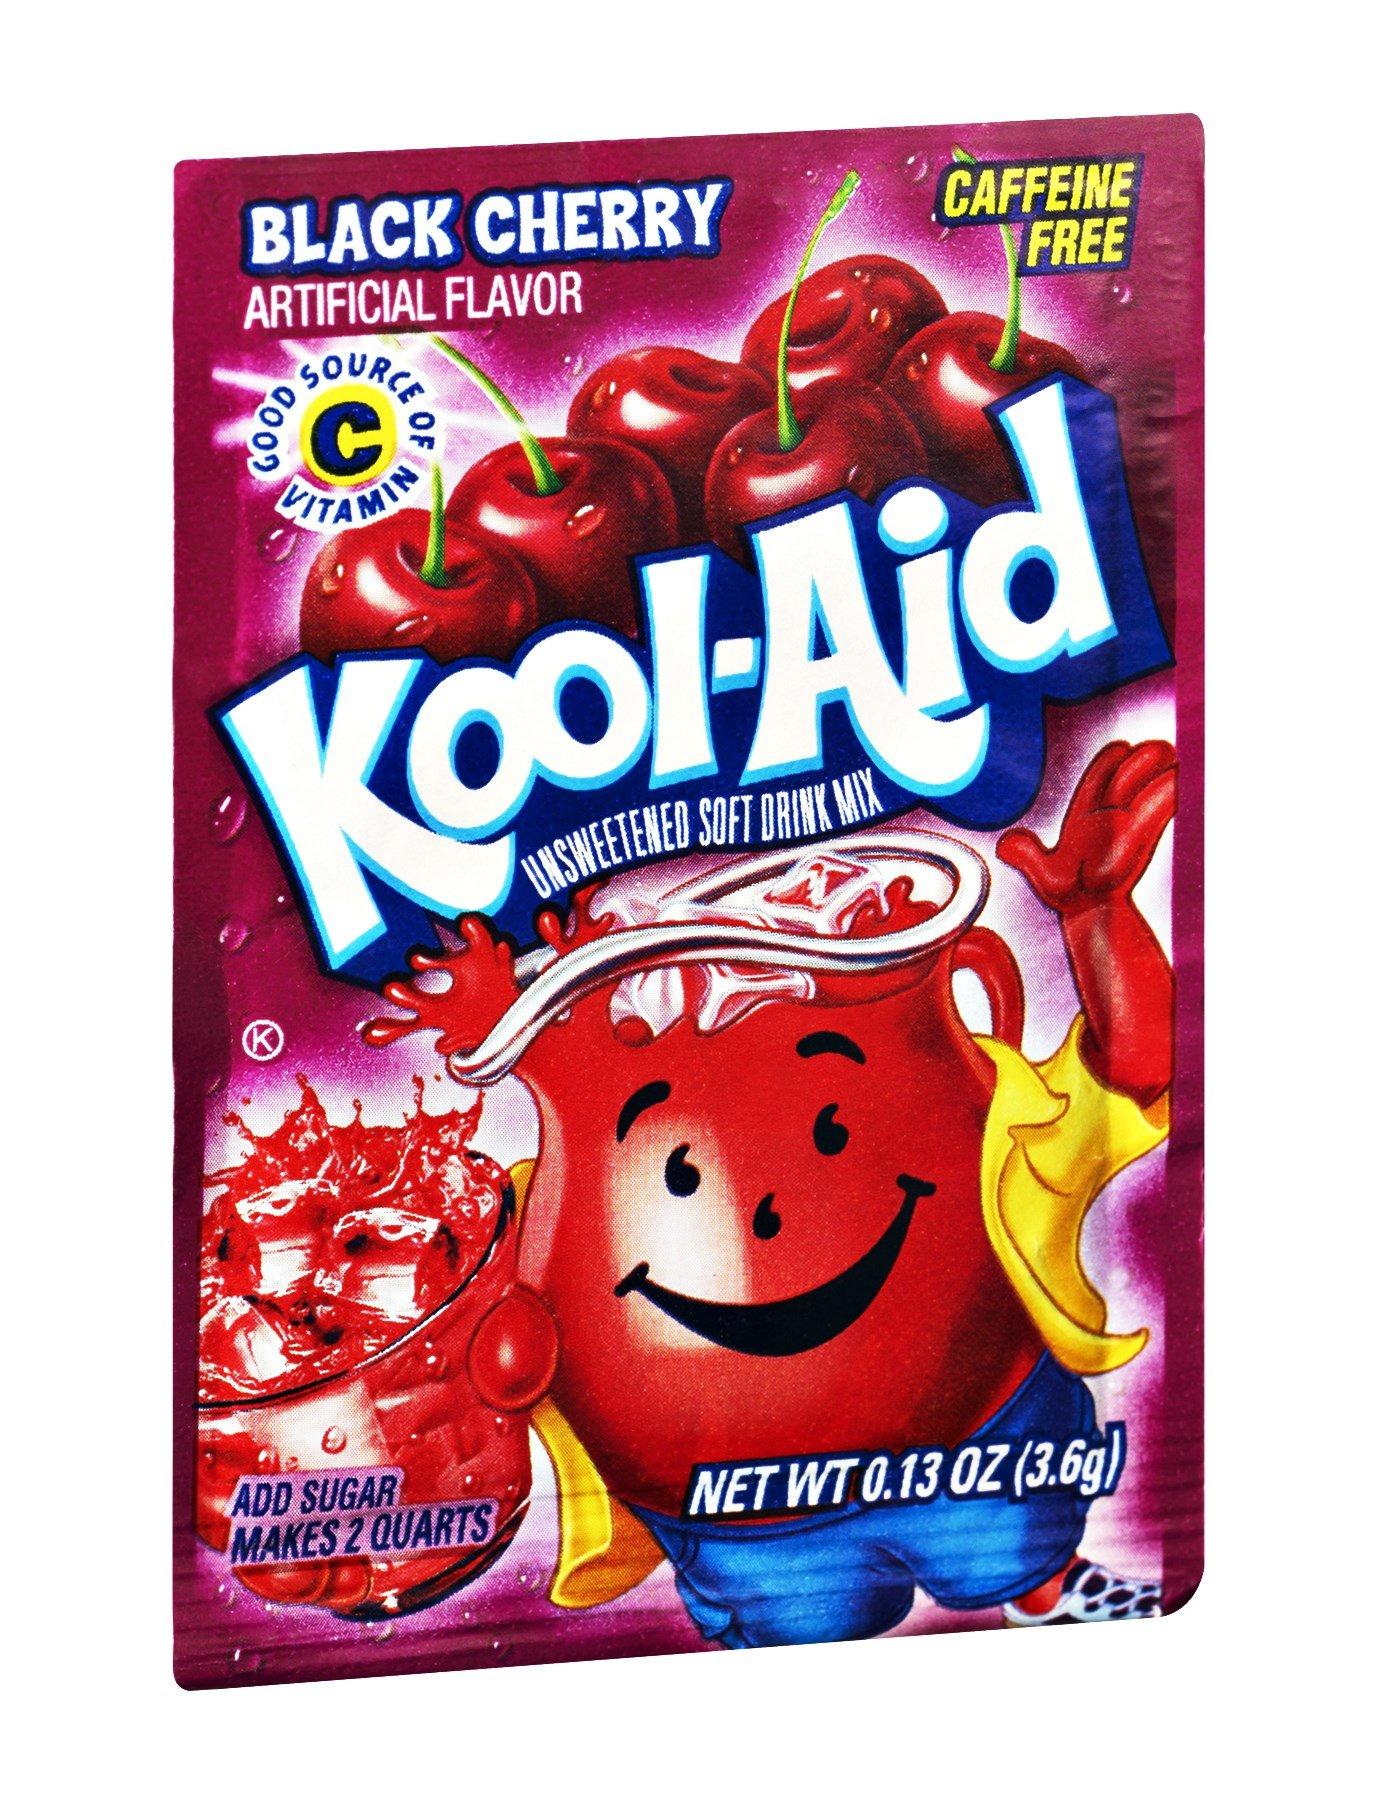 Kool-Aid Black Cherry Caffeine Free Unsweetened Soft Drink Mix, 0.13 OZ (Pack of 192)